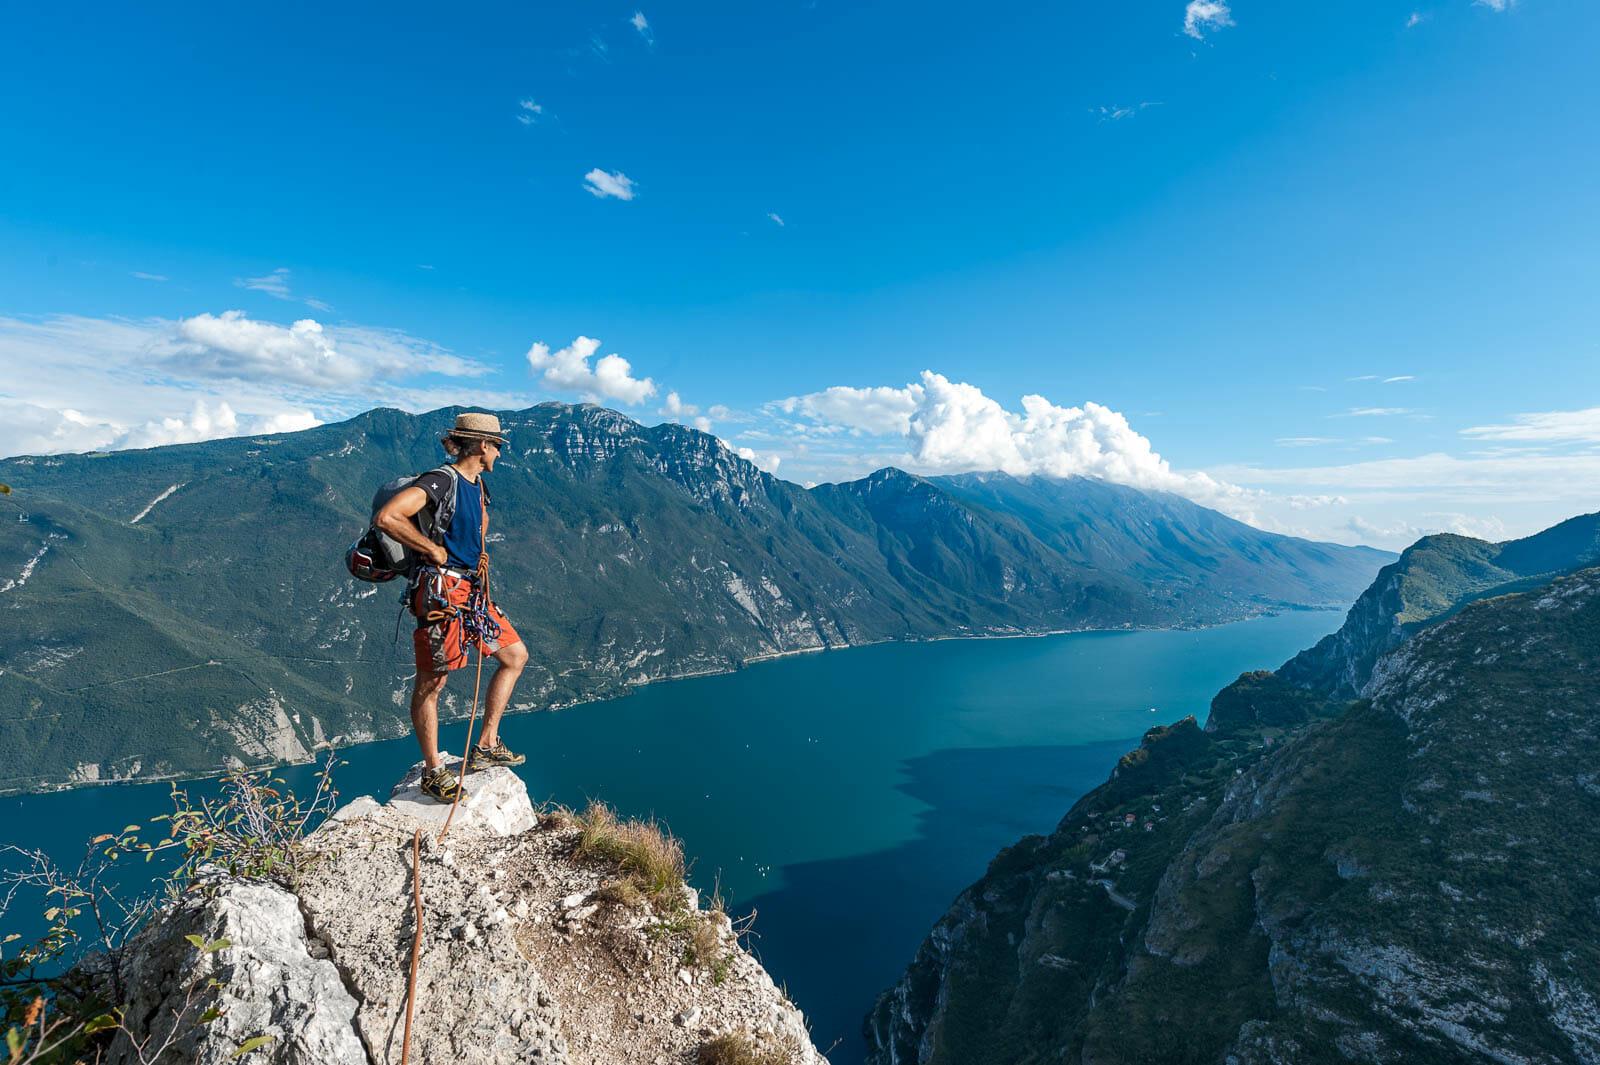 bergführer am pamoramapunkt von cima capi